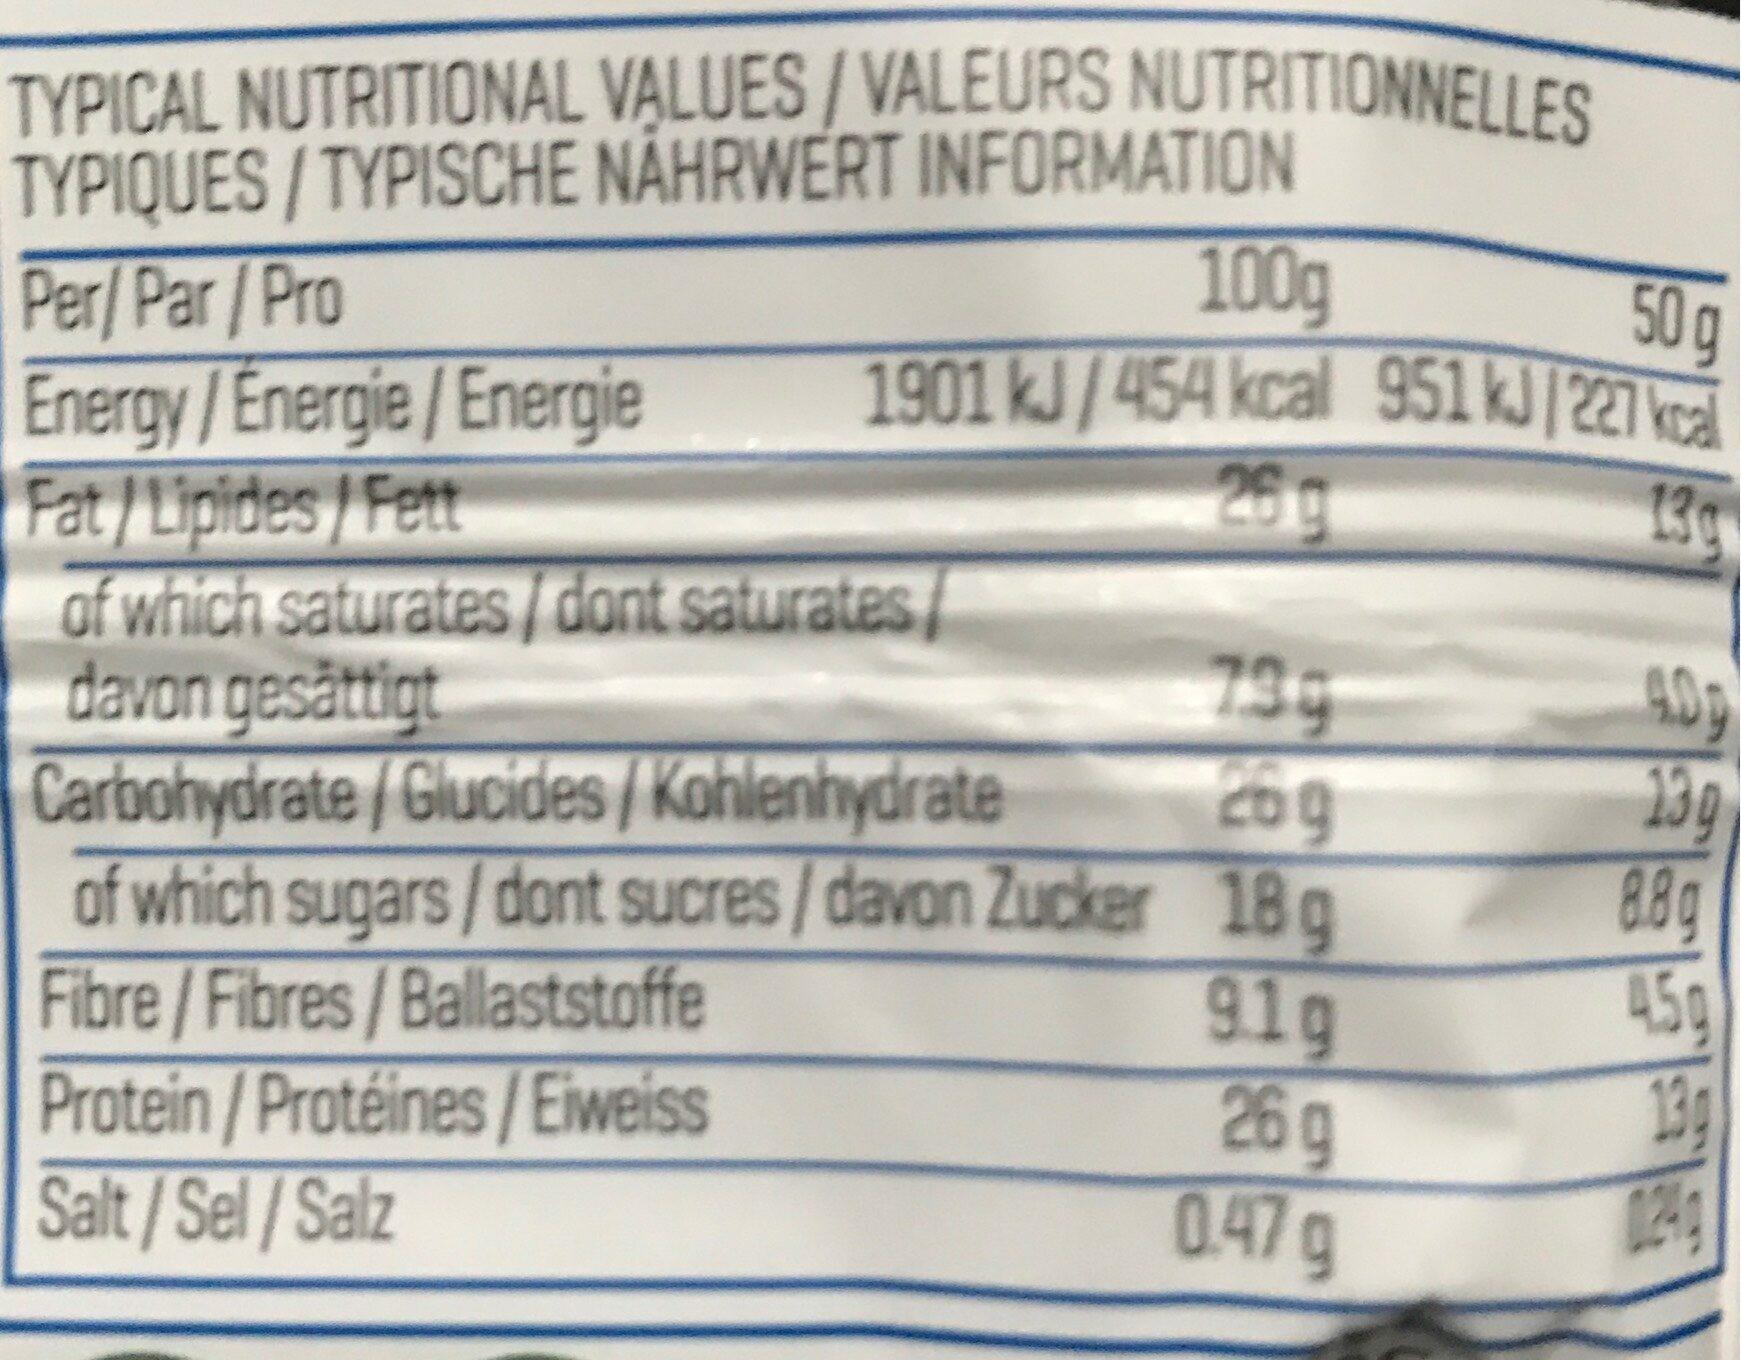 Vegan Protein Bar - Nutrition facts